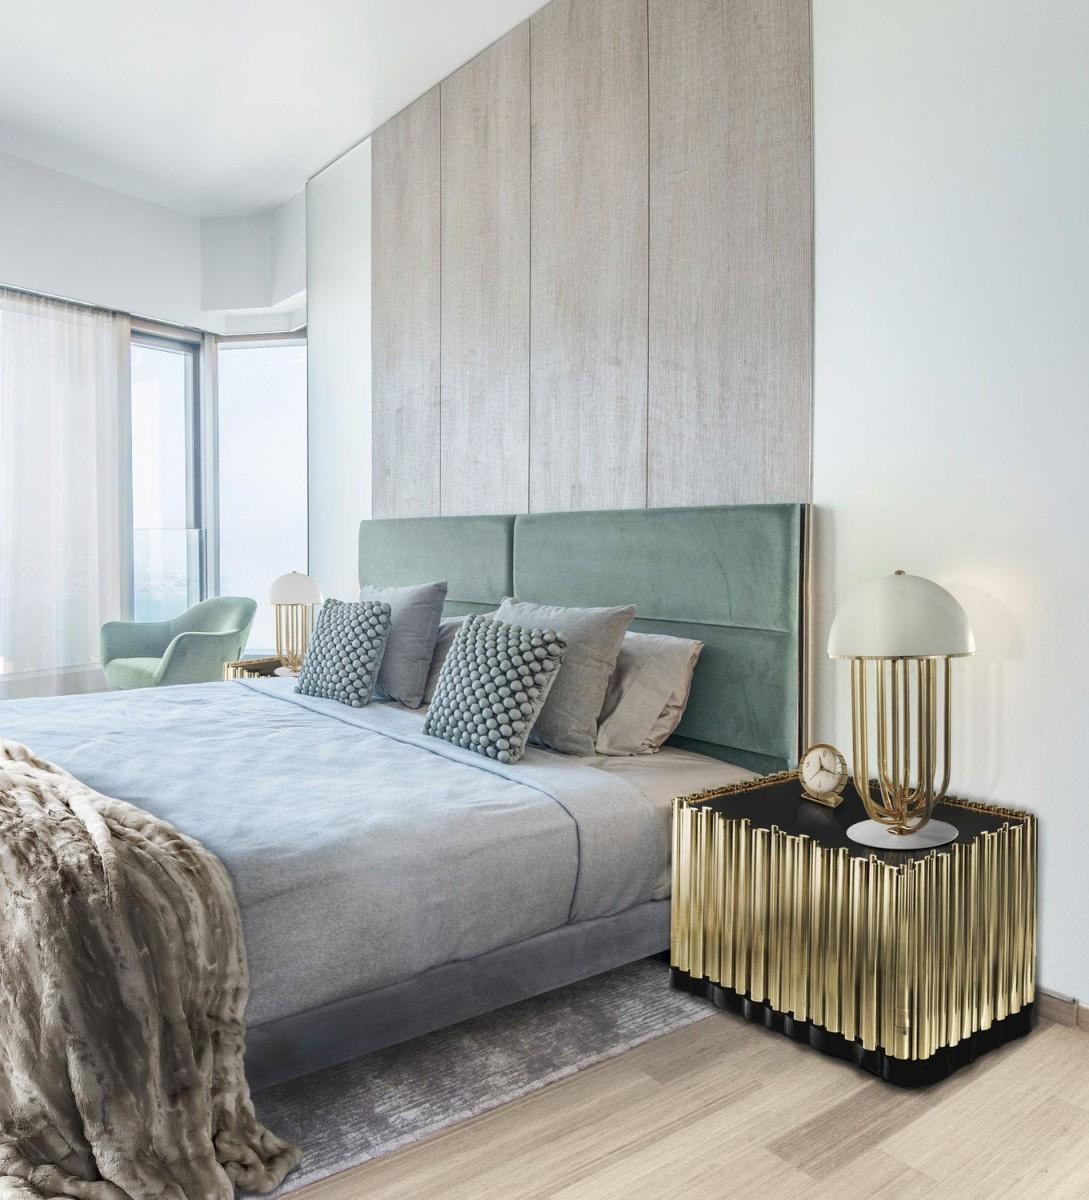 Modern bedroom design ideas 2016 - Modern Bedroom Design Ideas 2016 55